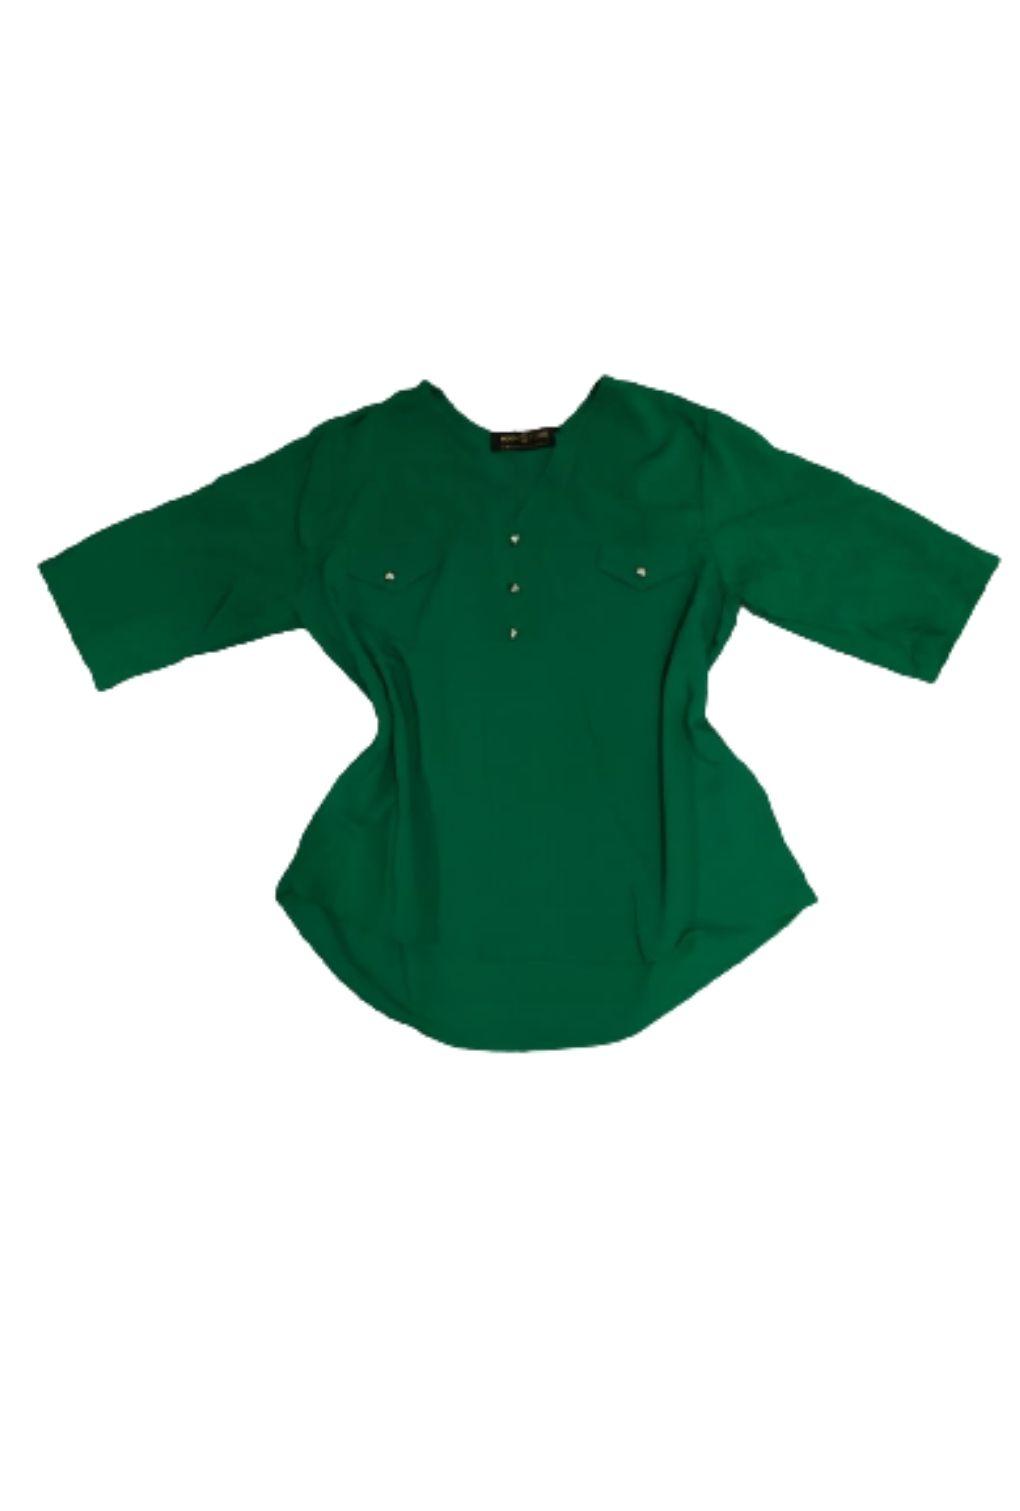 Camisa Blusa Feminina Manga Curta Social Verde Bandeira  - ModaStore | Moda Feminina